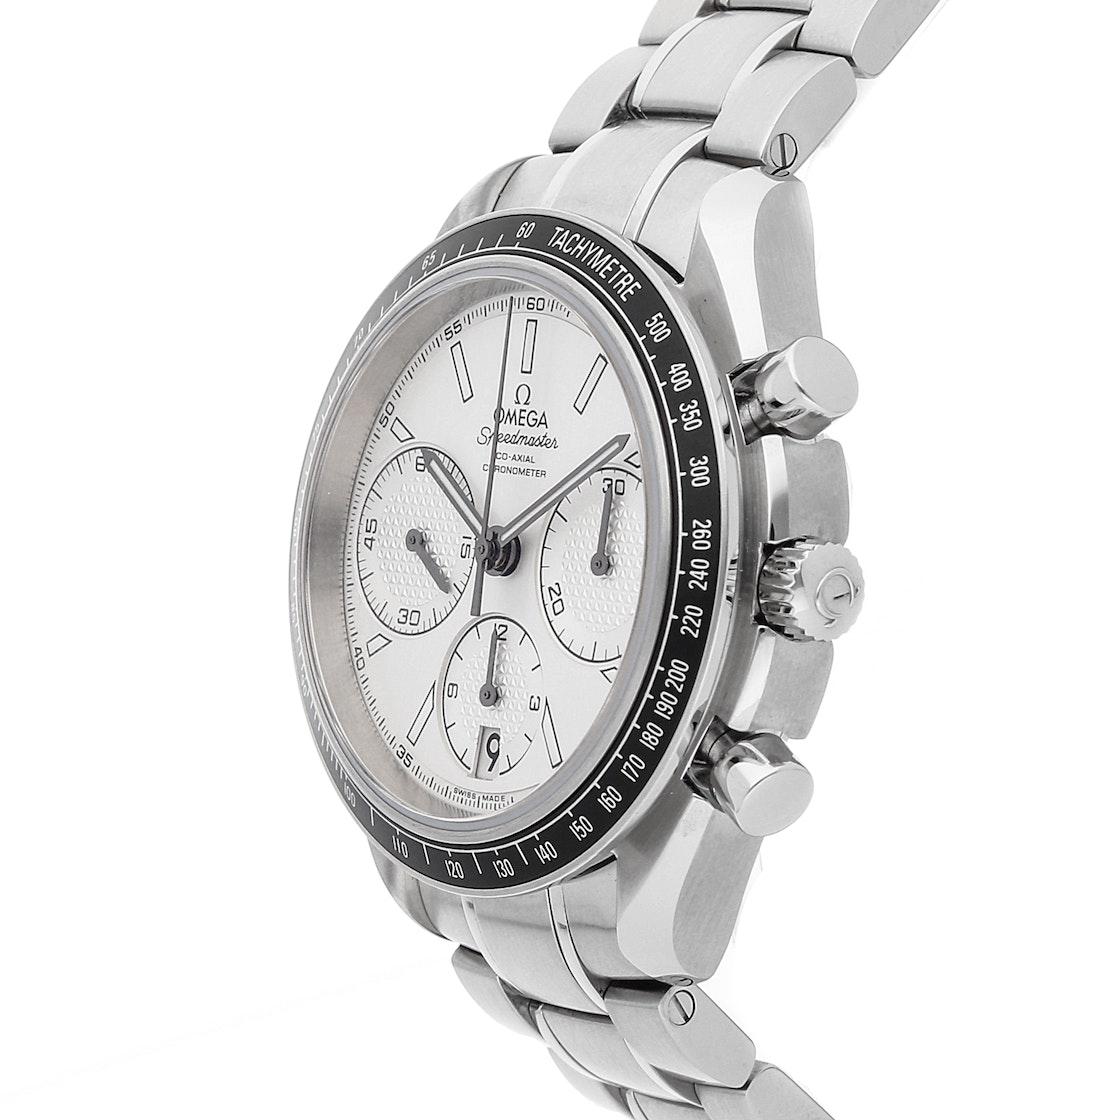 Omega Speedmaster Racing Chronograph 326.30.40.50.02.001